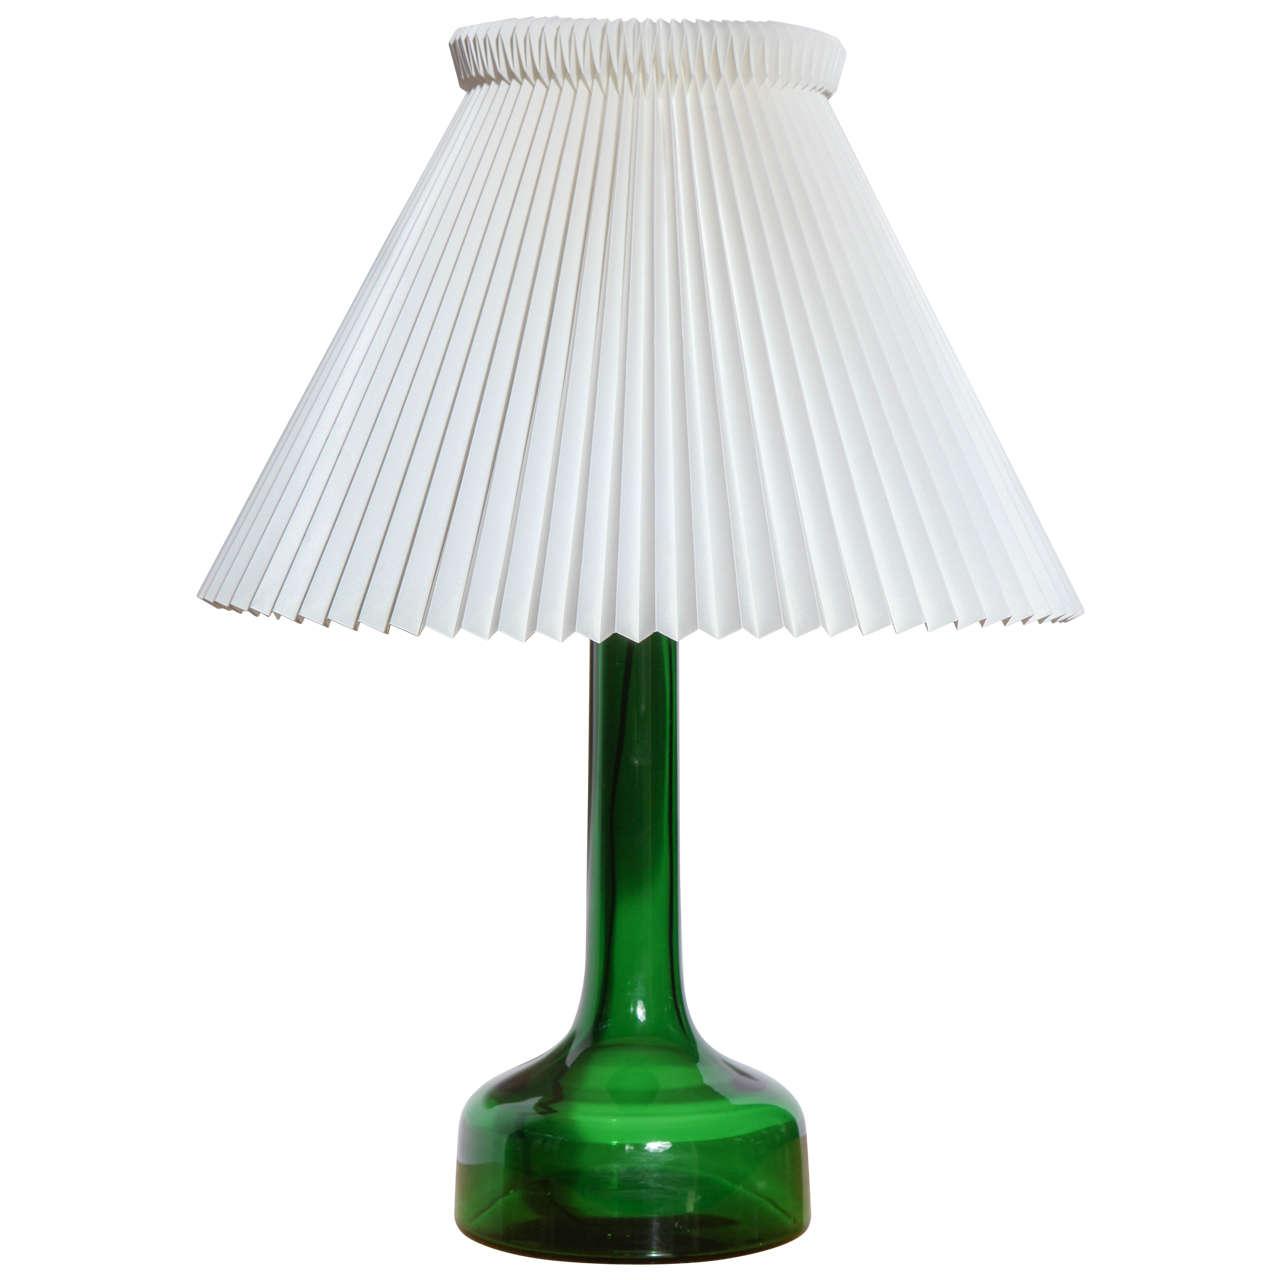 Vintage 343 Table Lamp by Gunnar Biilmann-Petersen, Mfg. Le Klint